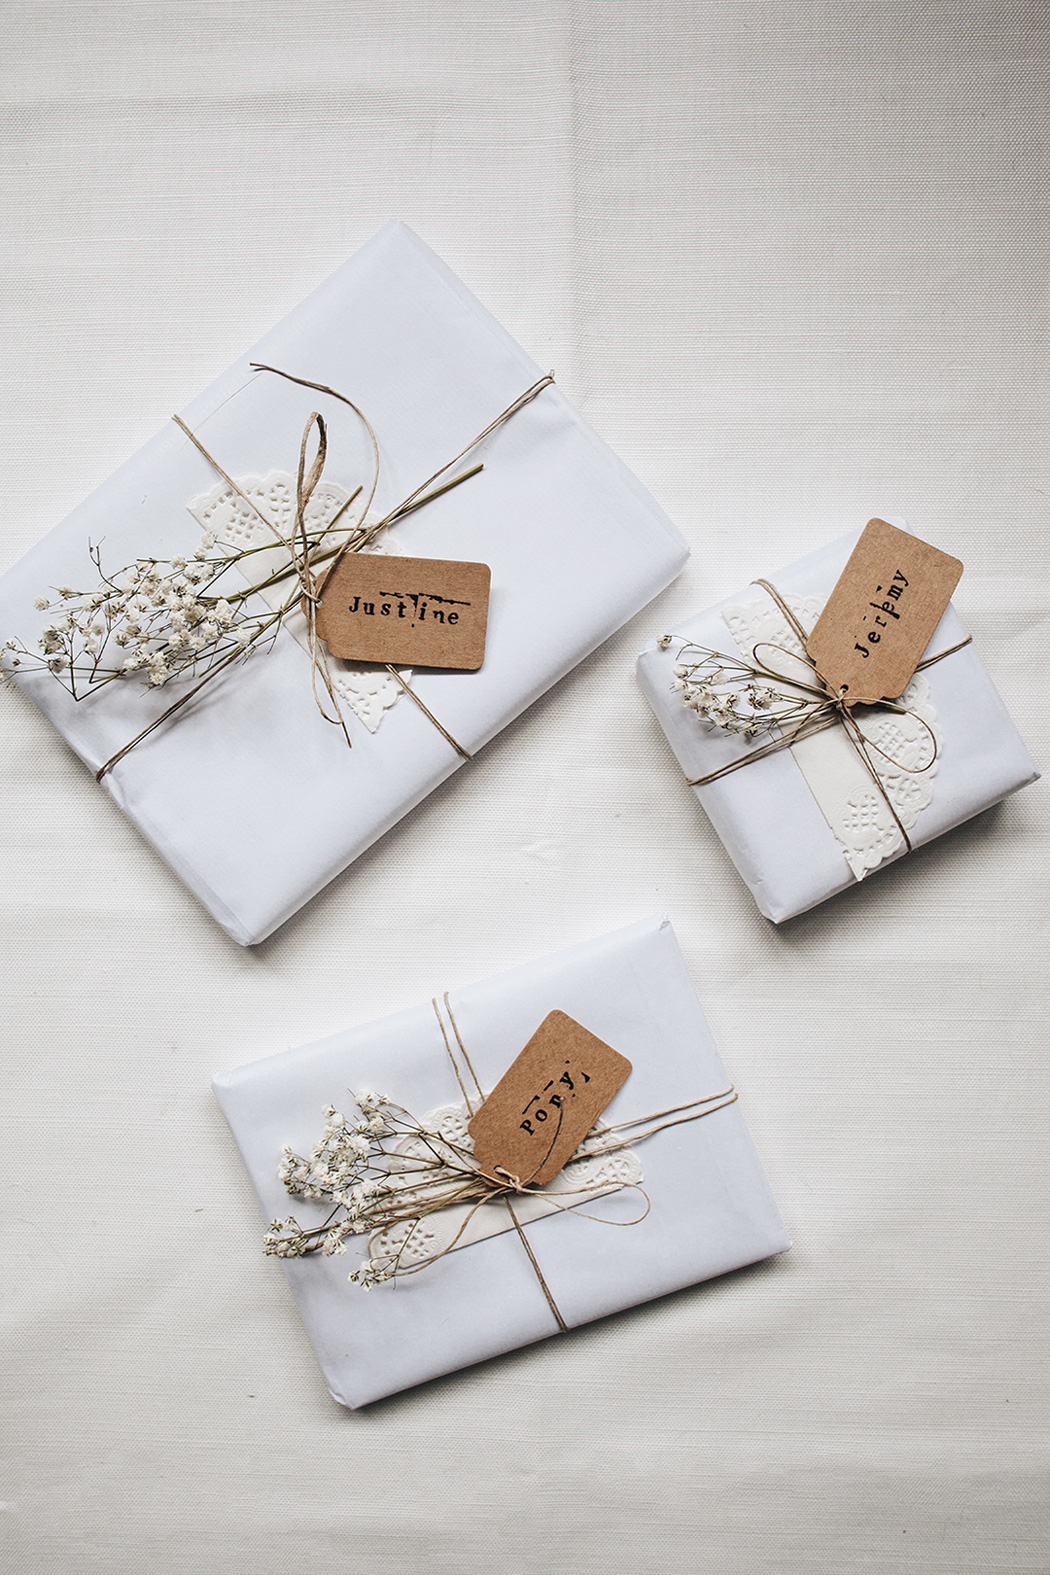 Diy Emballage De Cadeaux De No 235 L Moodfeather